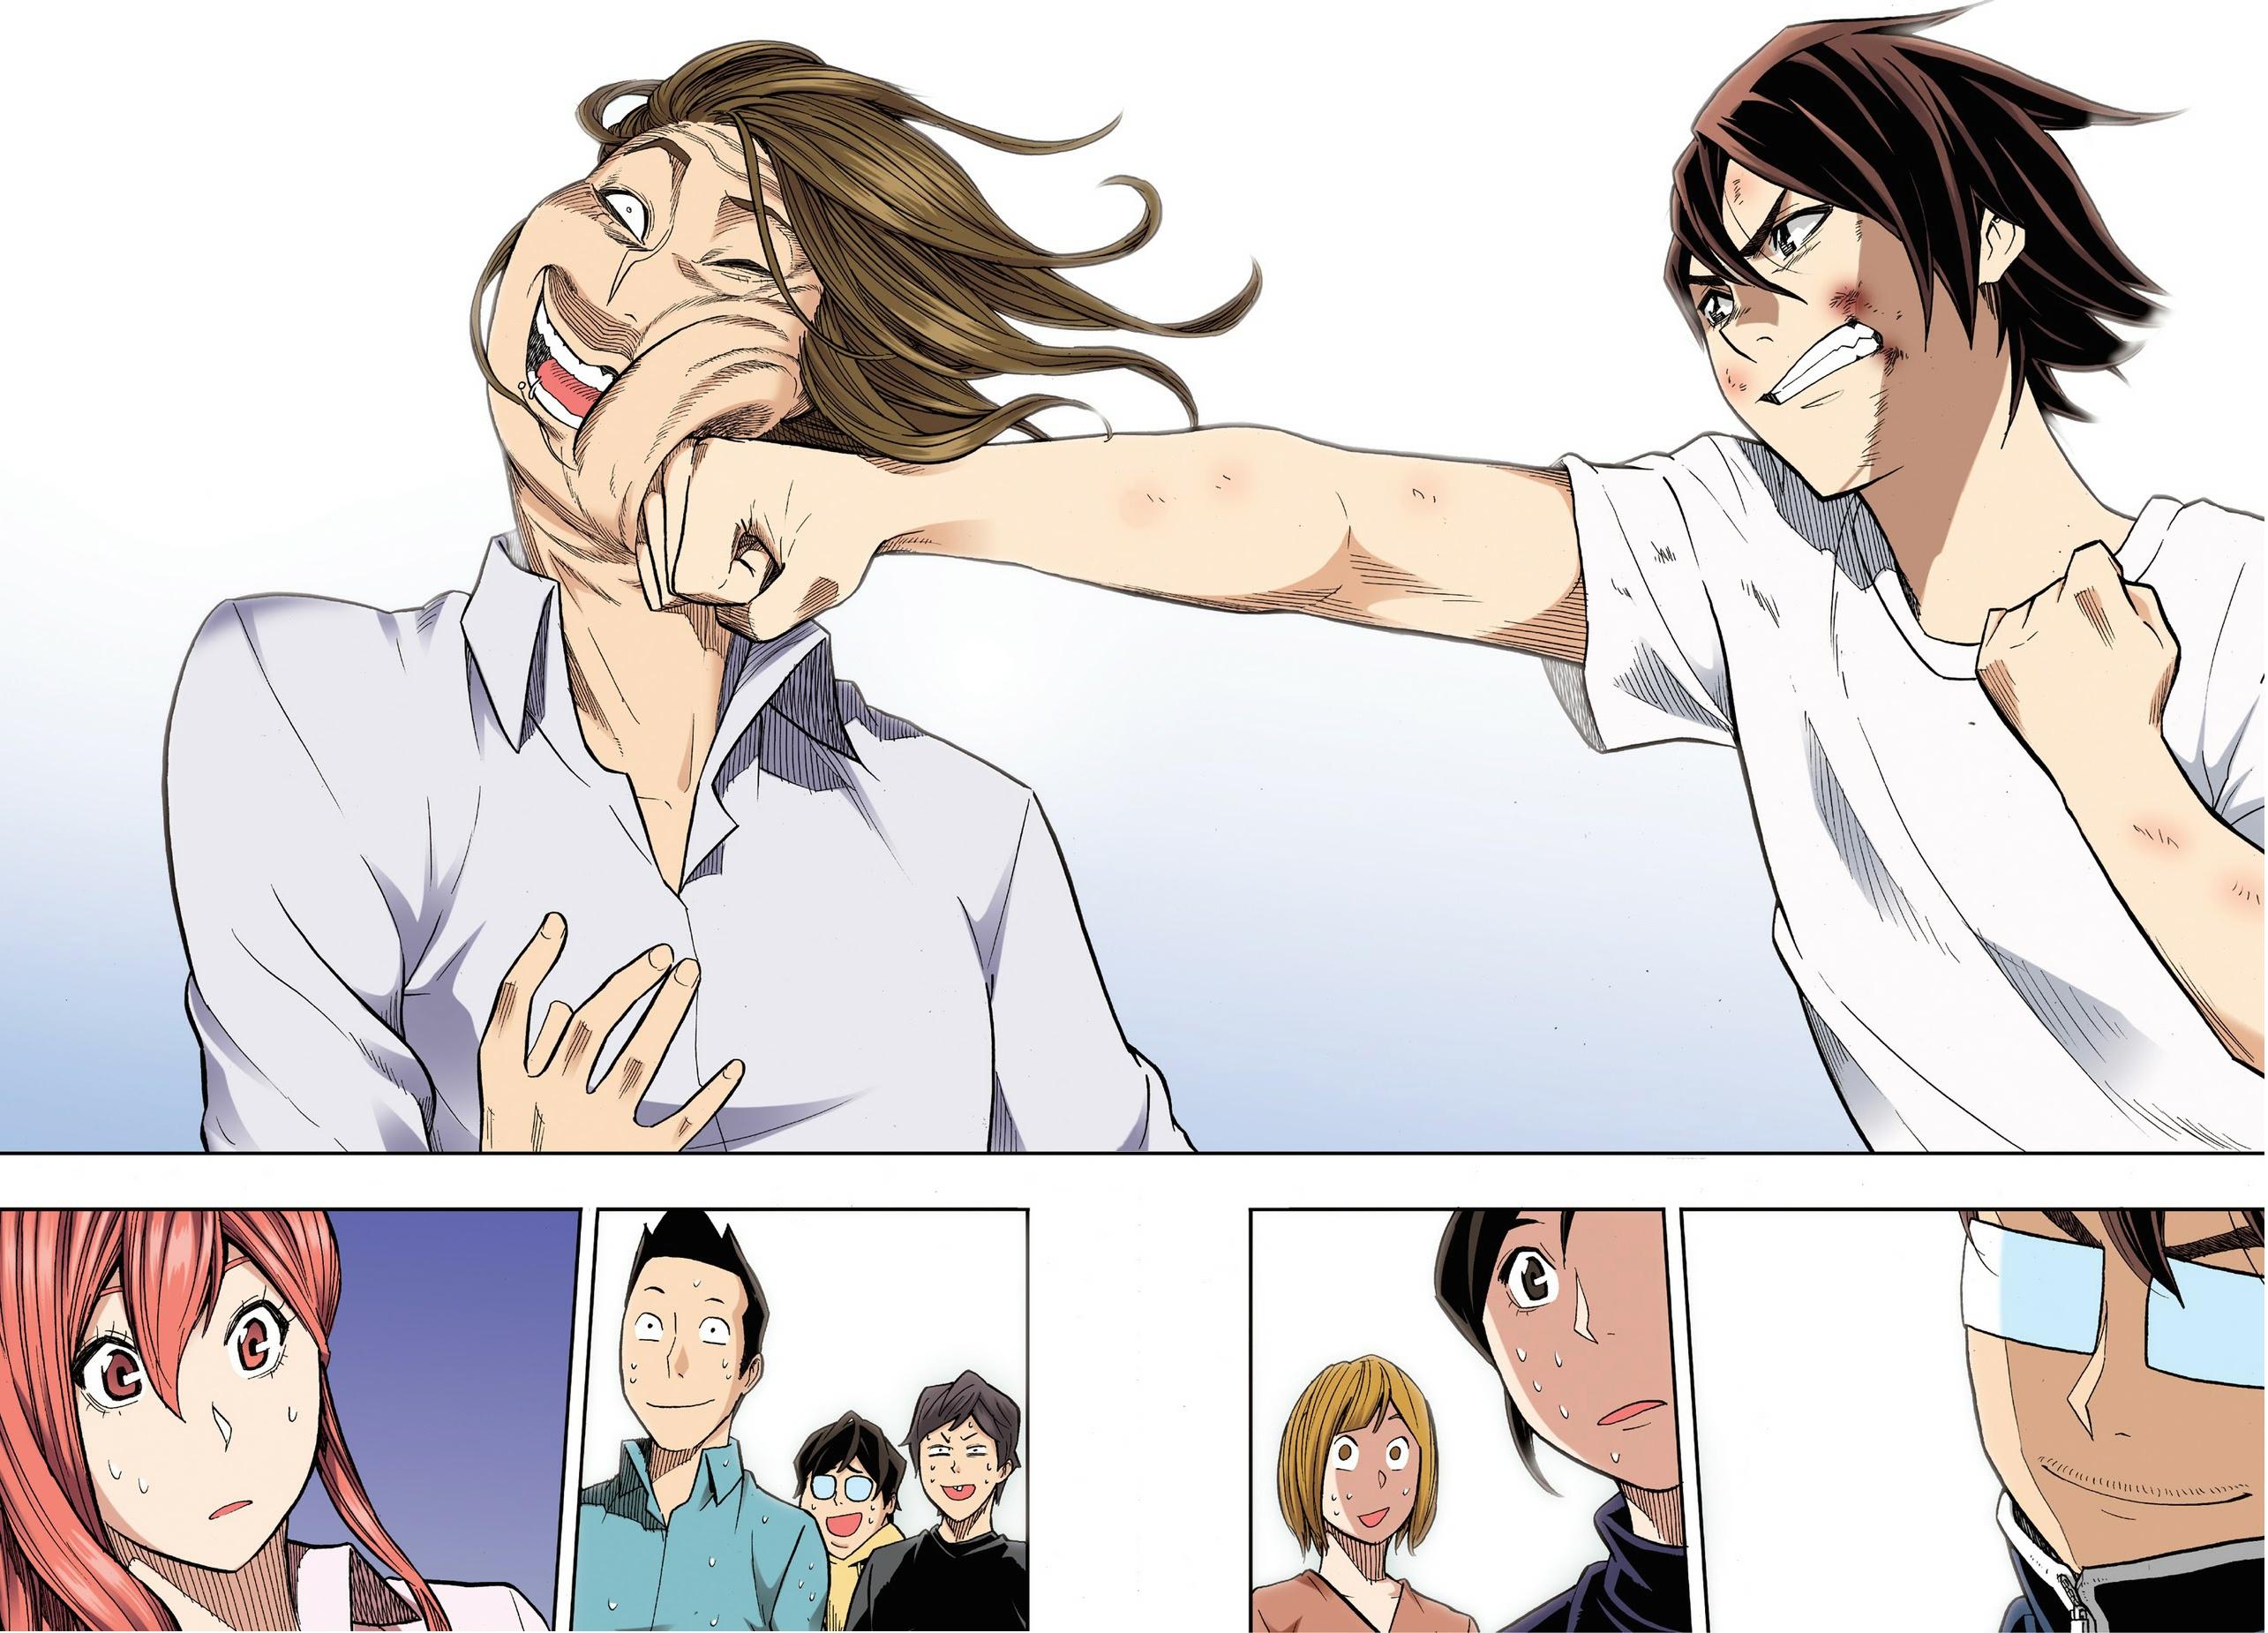 http://c5.ninemanga.com/es_manga/11/14923/418292/0683cb9c246e61ab7ea3e28fc50693ea.jpg Page 21